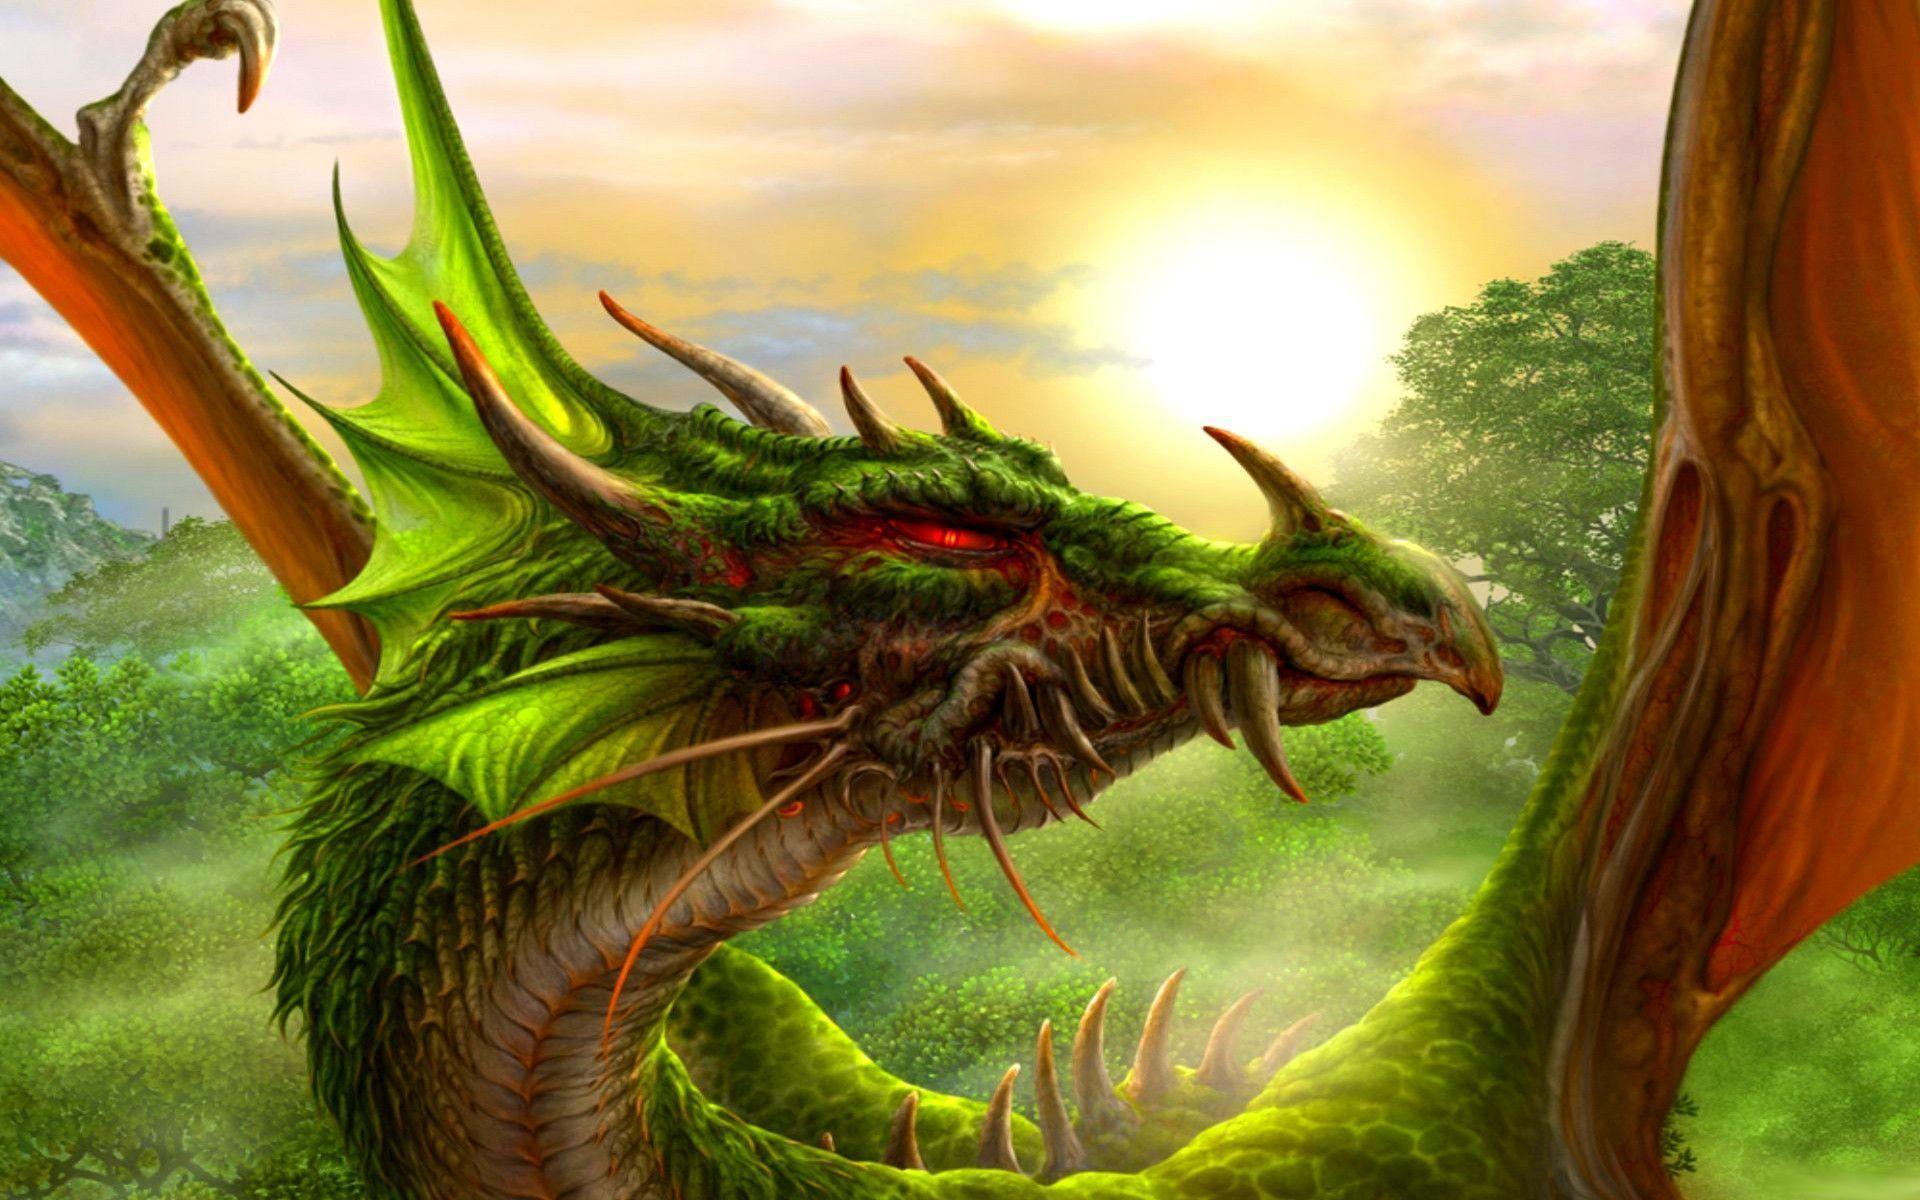 Earth Dragon: Green Dragon Wallpapers